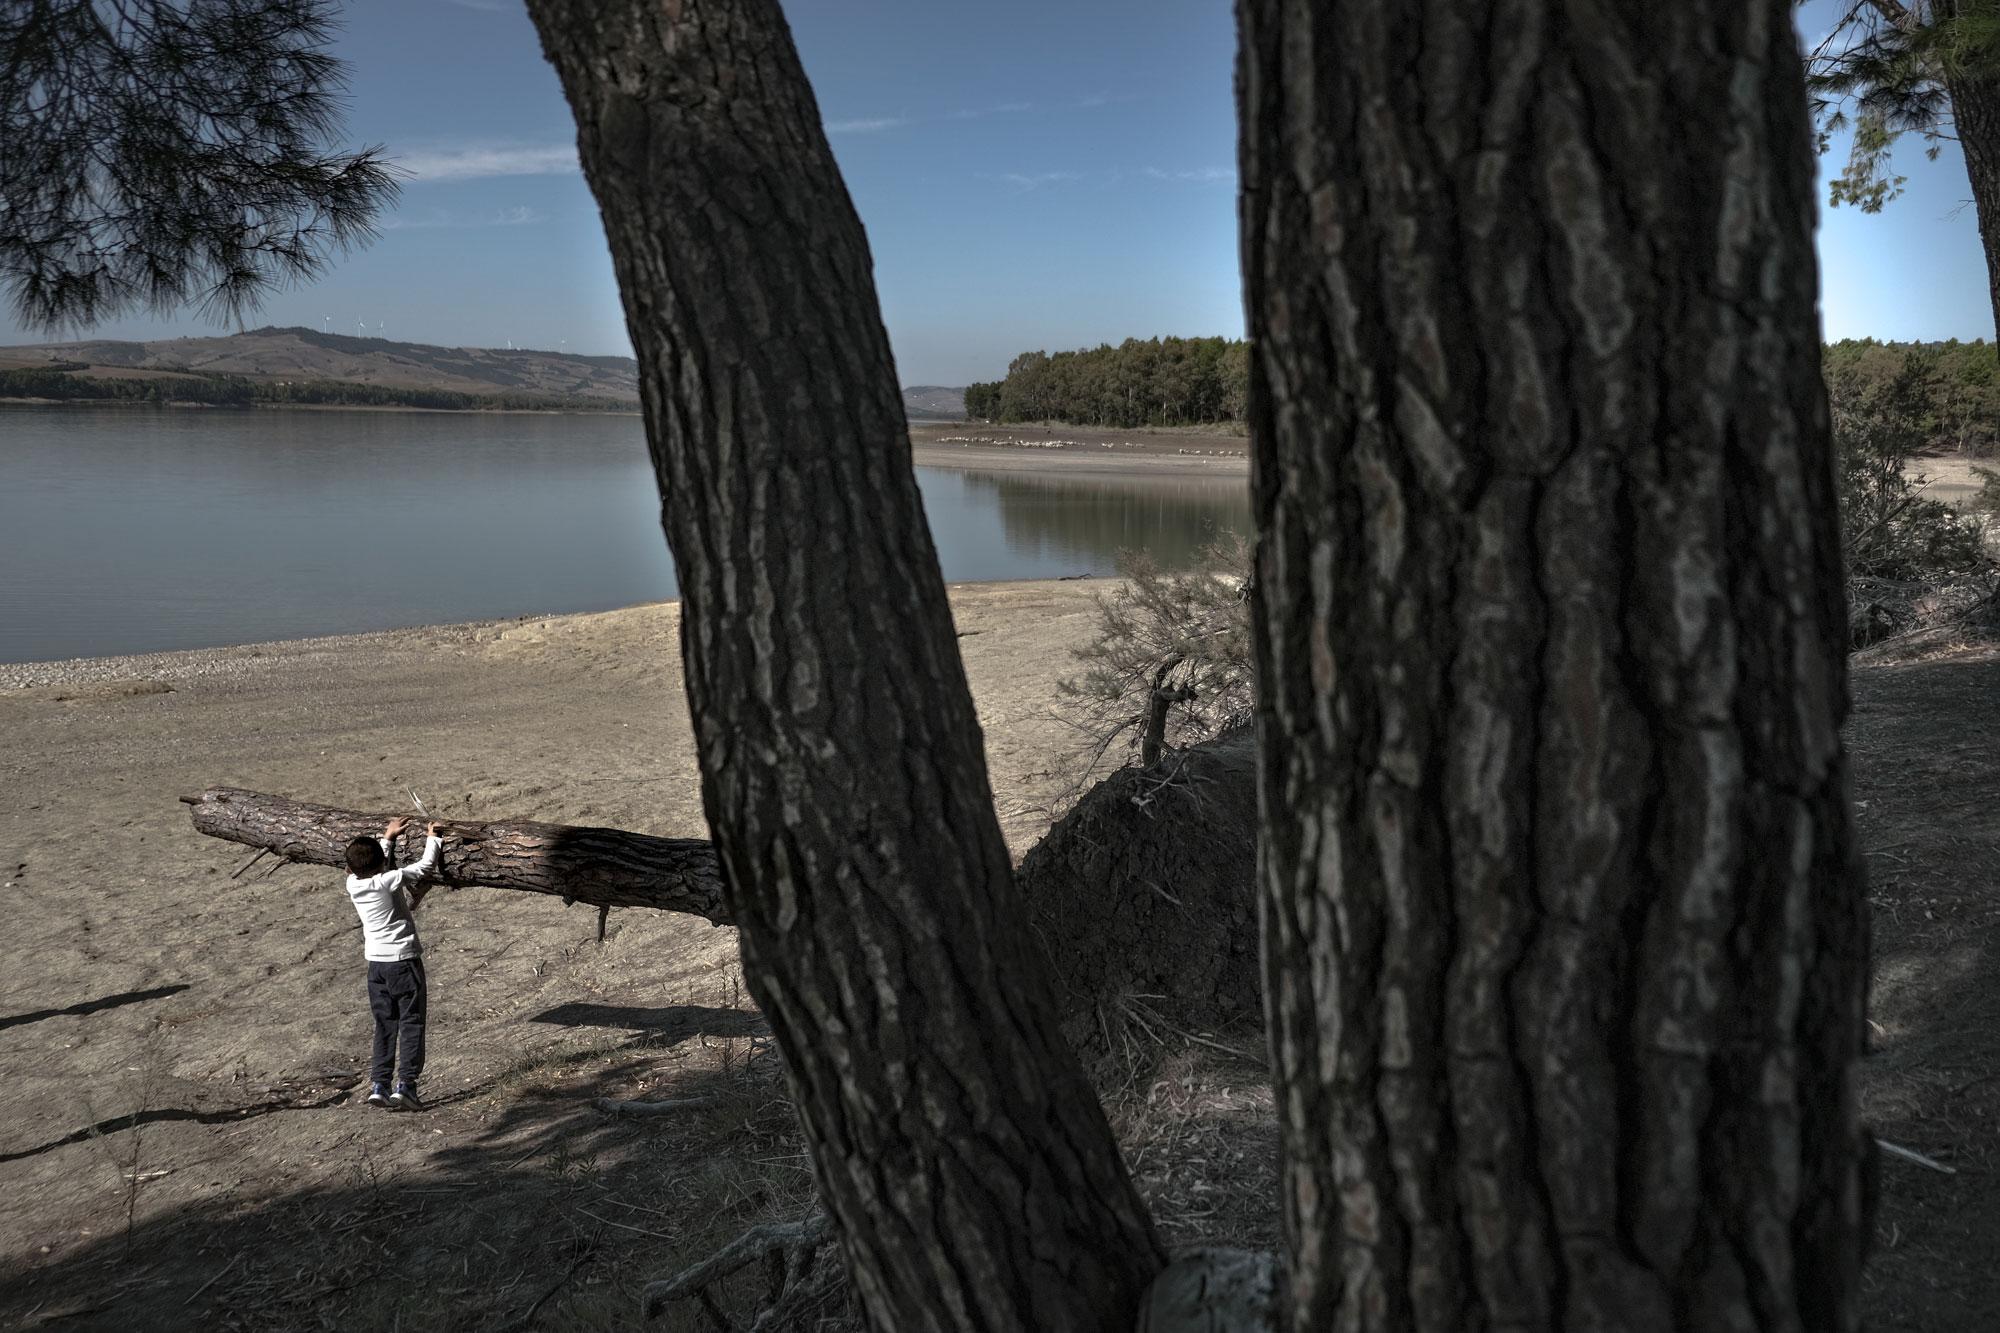 Un bambino gioca con un tronco all'oasi di San Giuliano